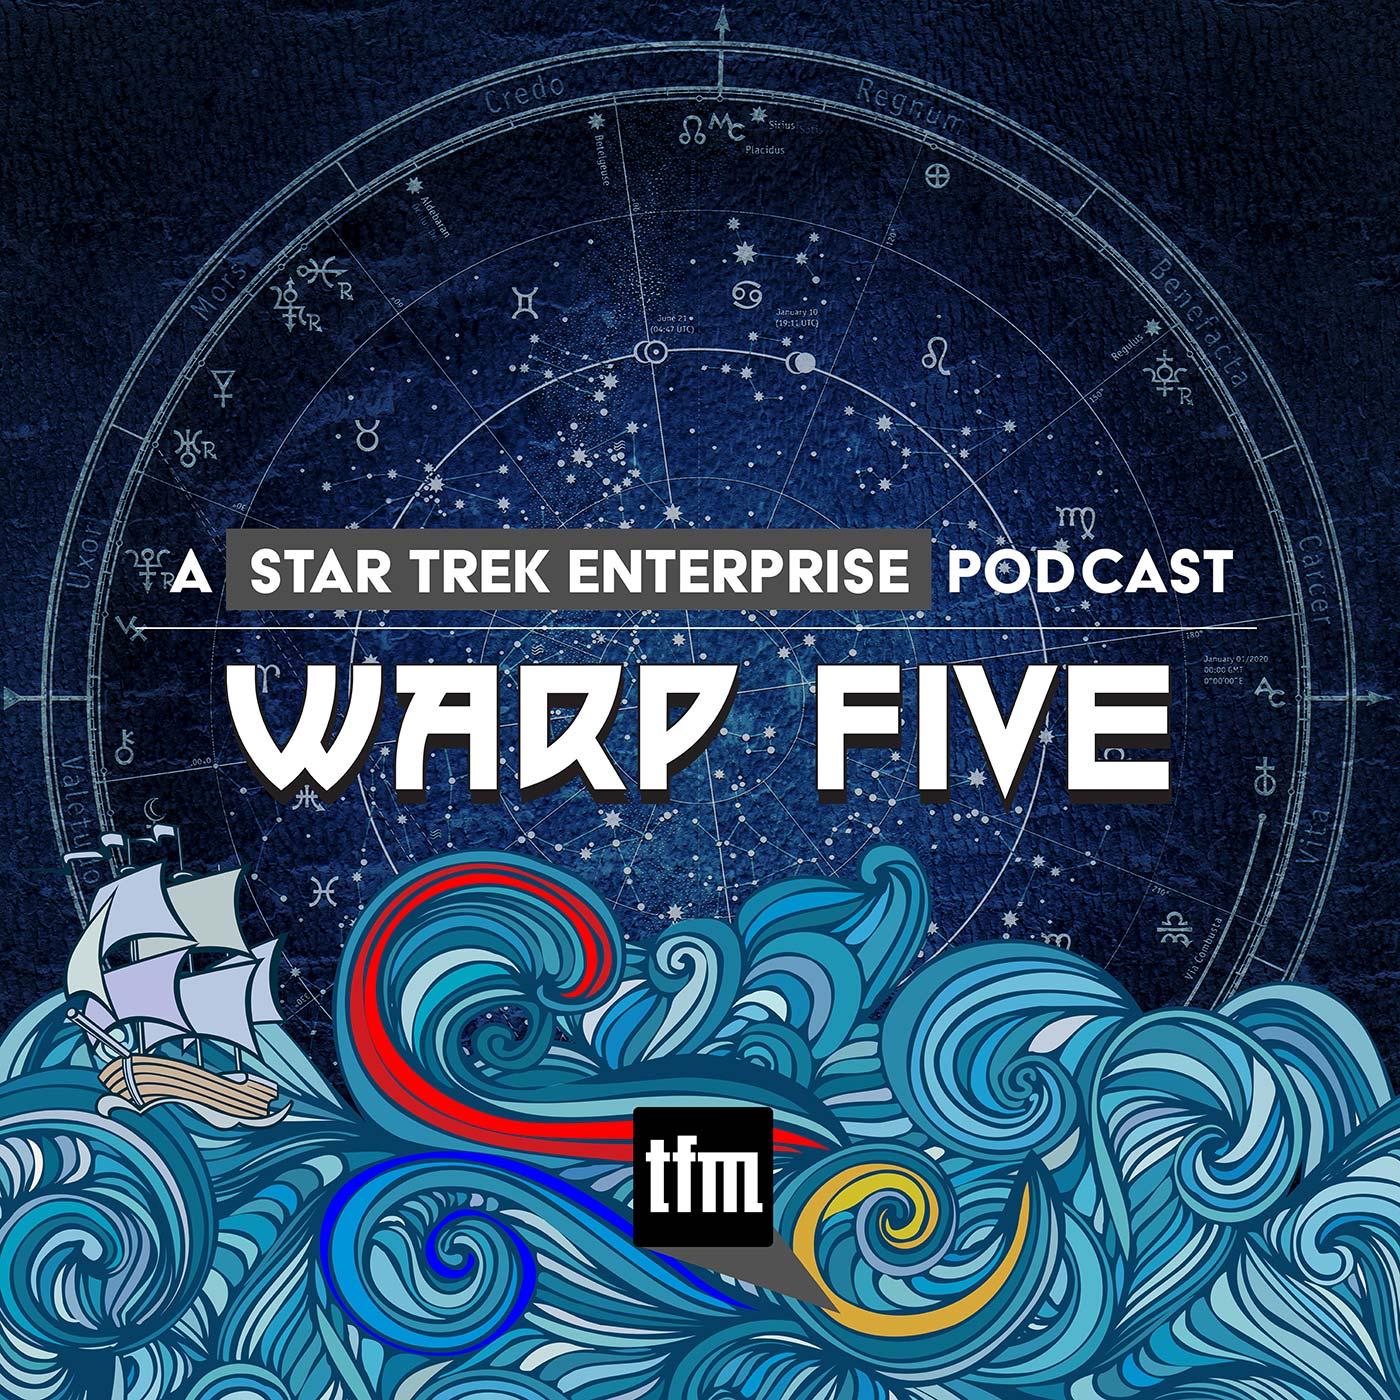 Warp Five: A Star Trek Enterprise Podcast